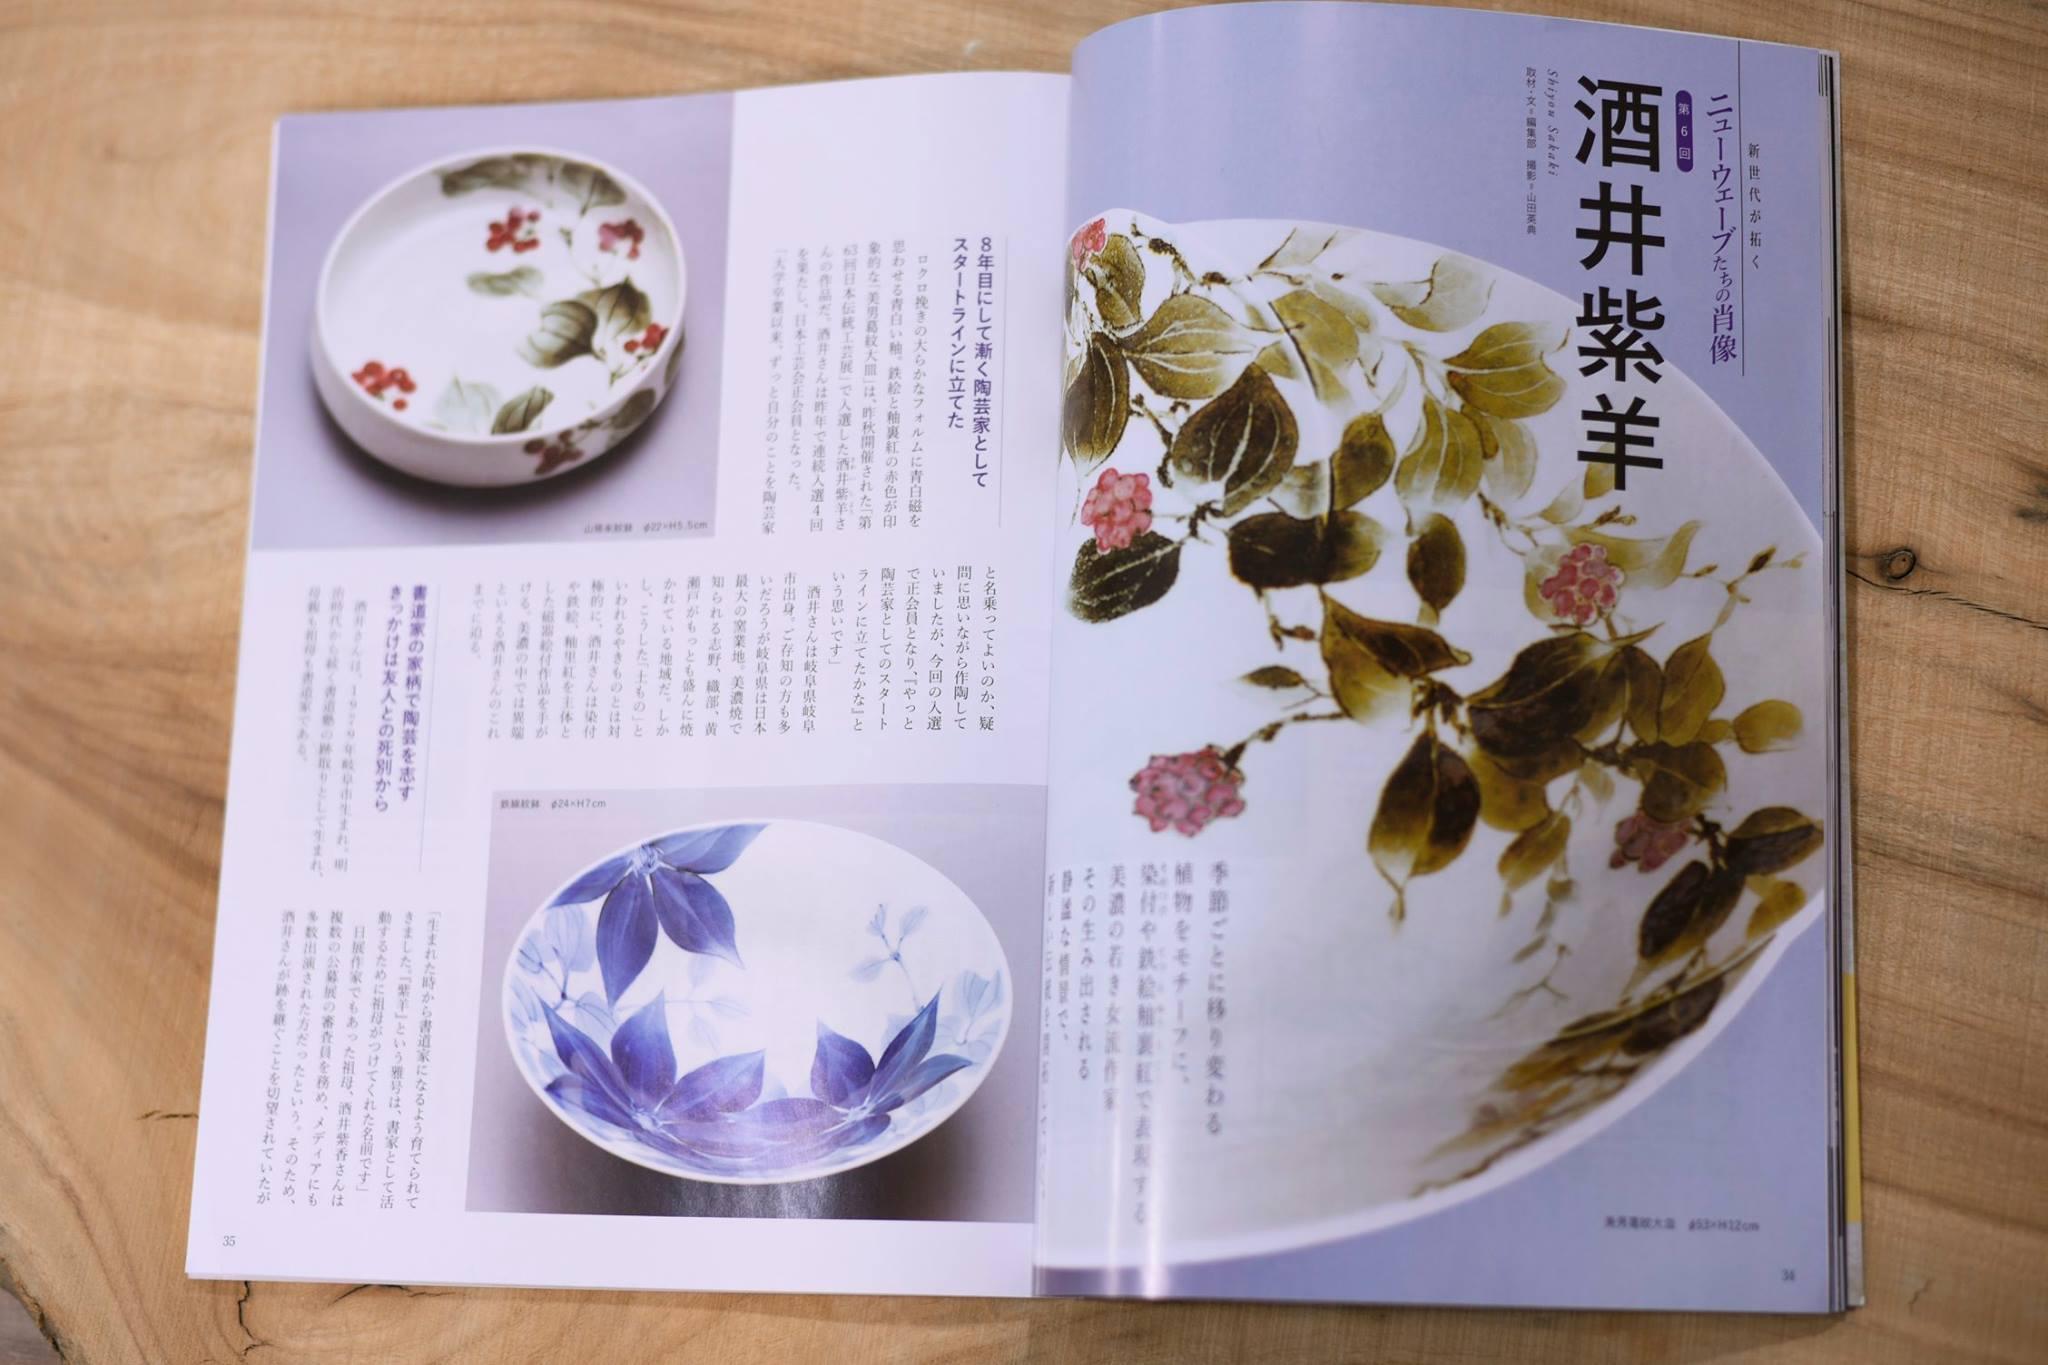 http://www.record-jp.com/news/entry_images/17349842_1439004239498535_1071718715647538832_o.jpg